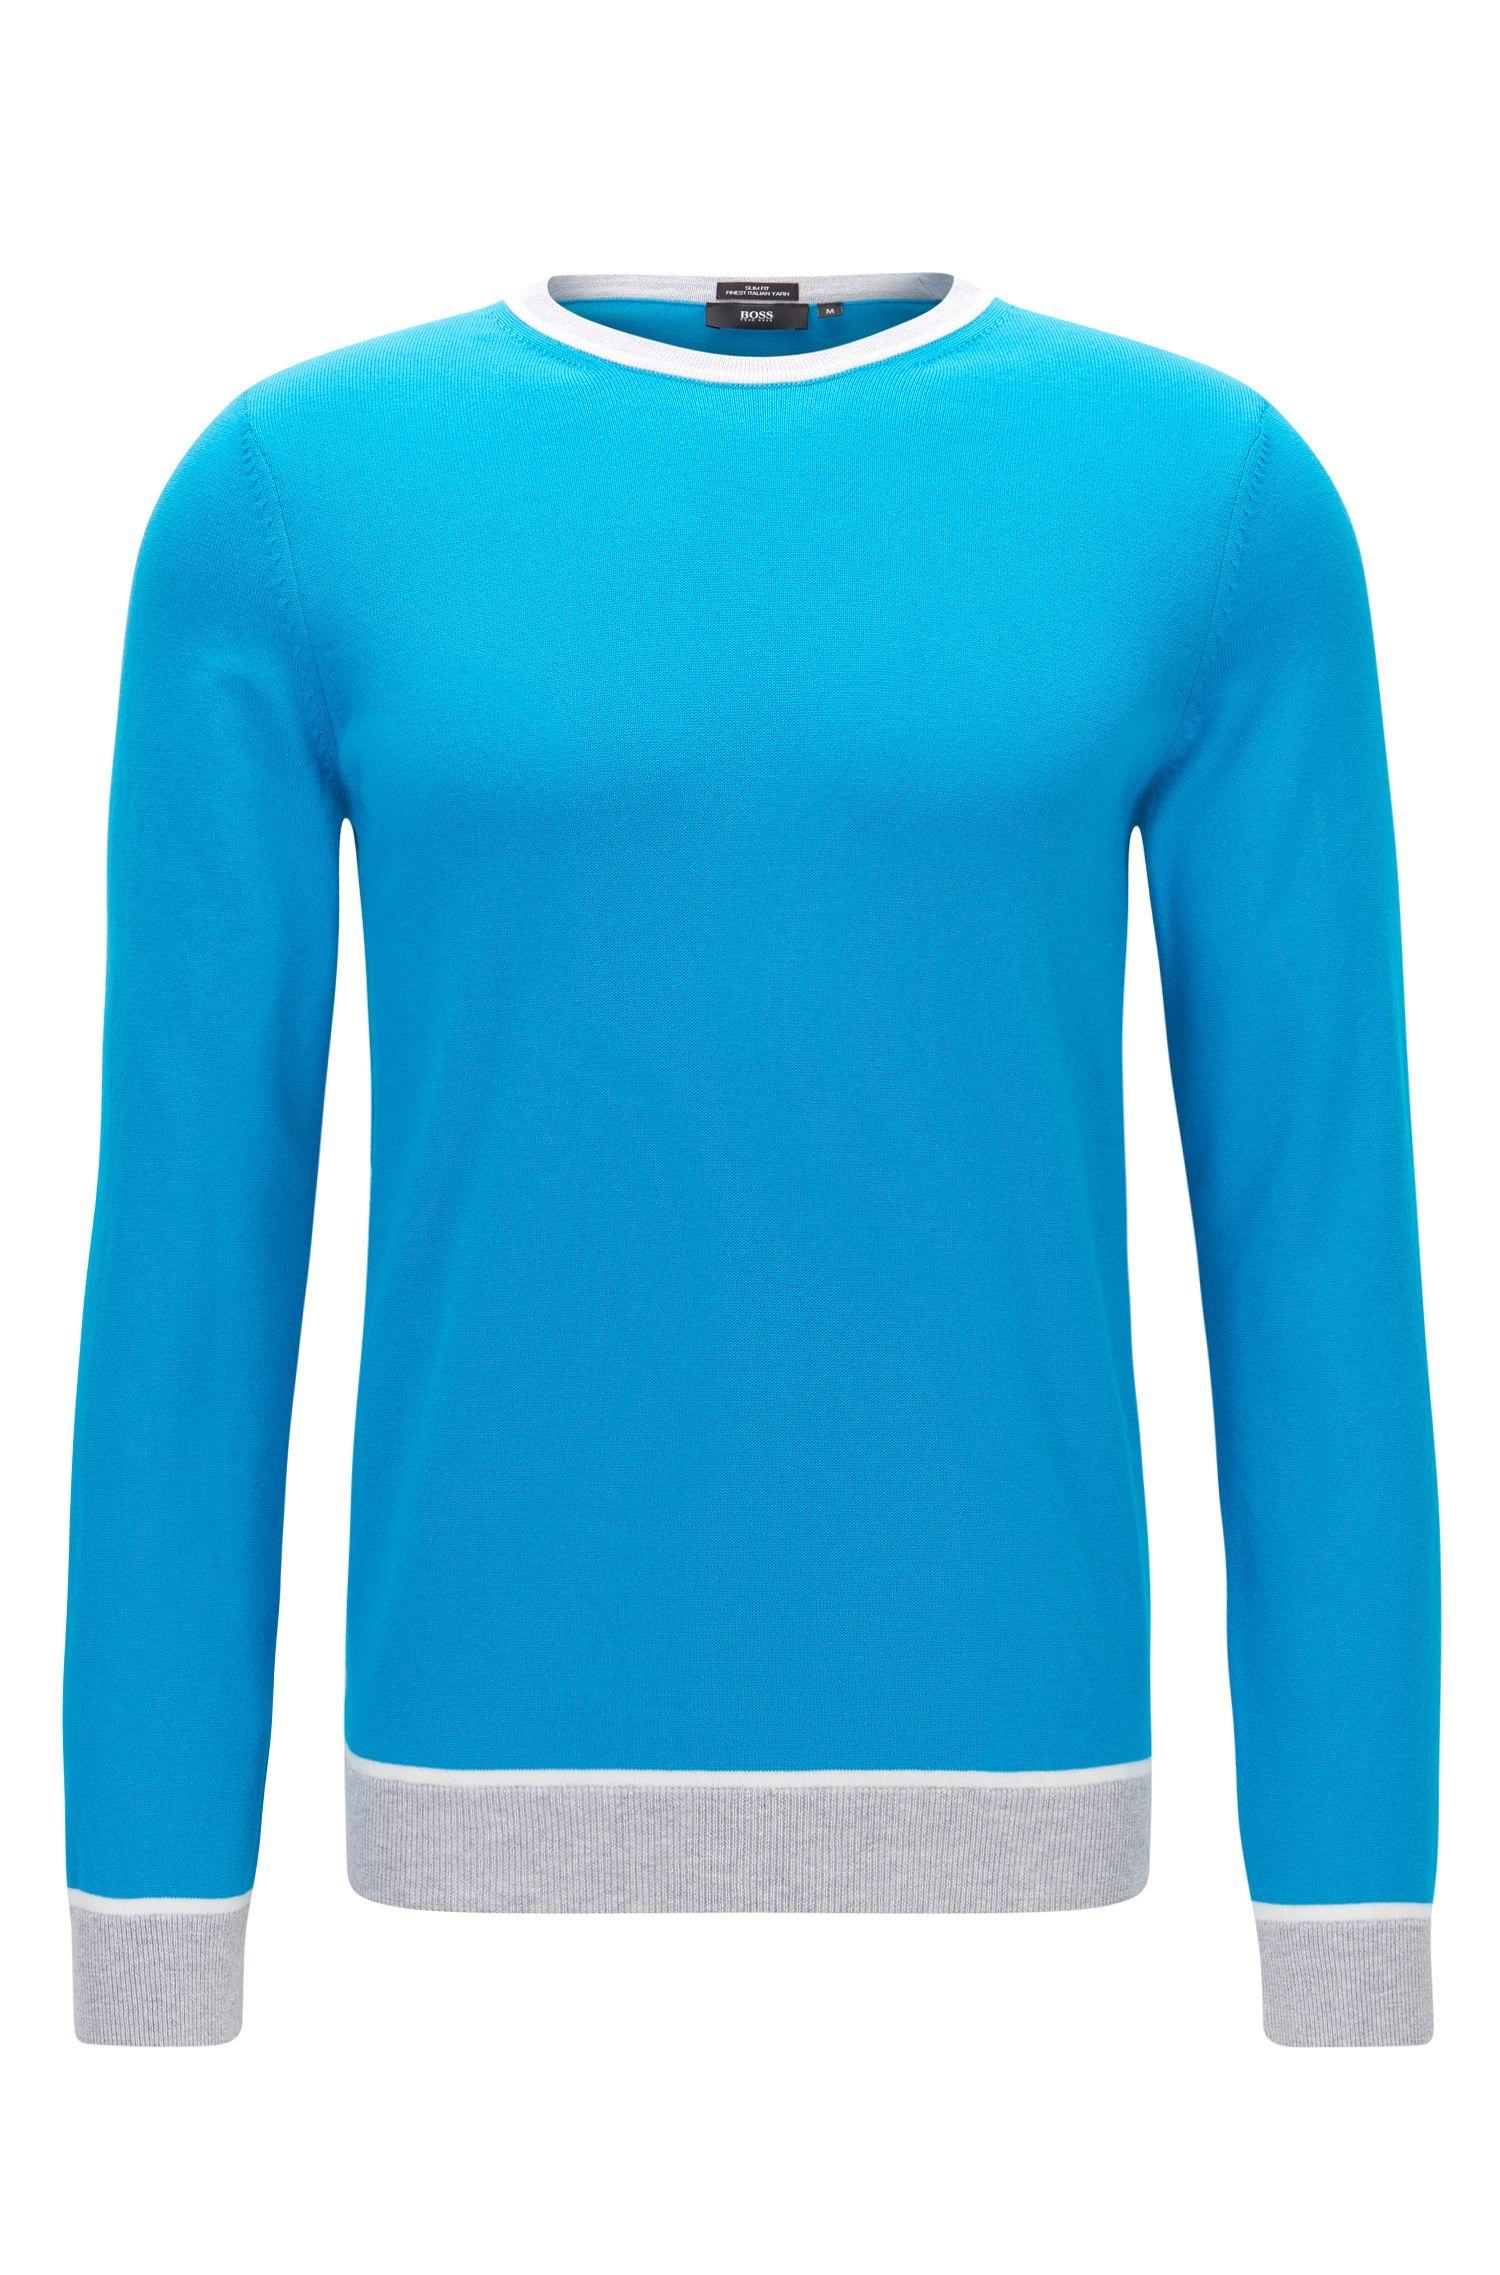 Slim-fit cotton sweater with colourblock details